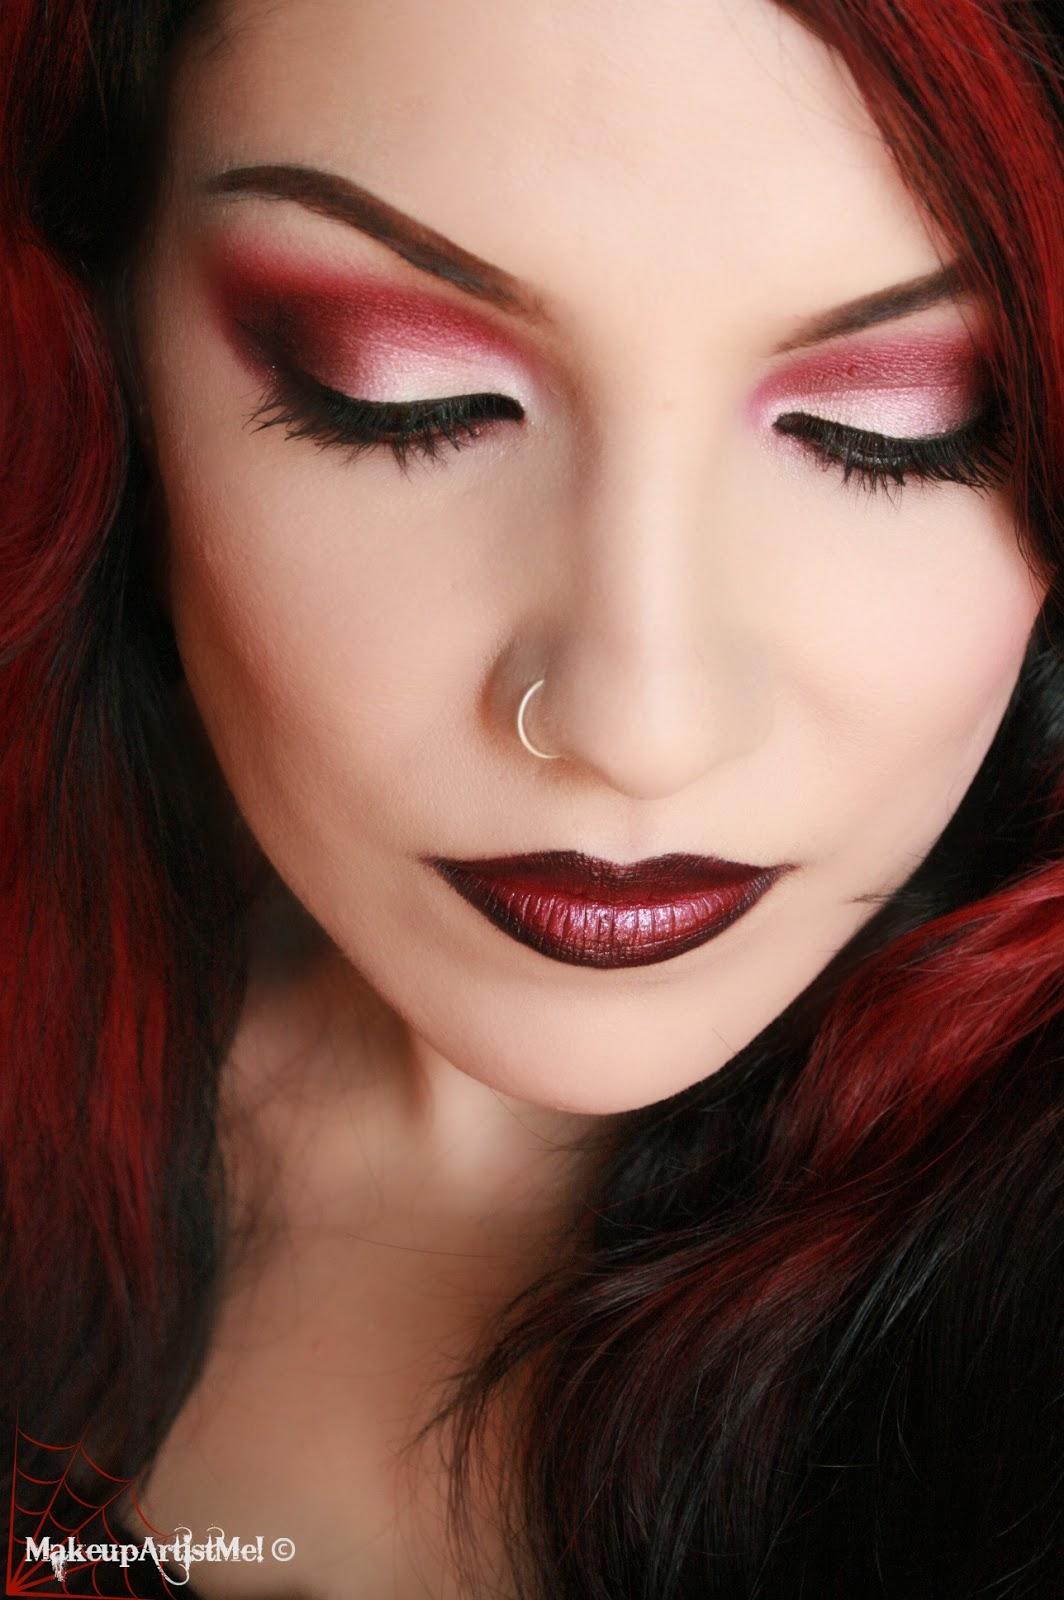 Make Up Artist Me Daring Red Eyeshadow Makeup Tutorial